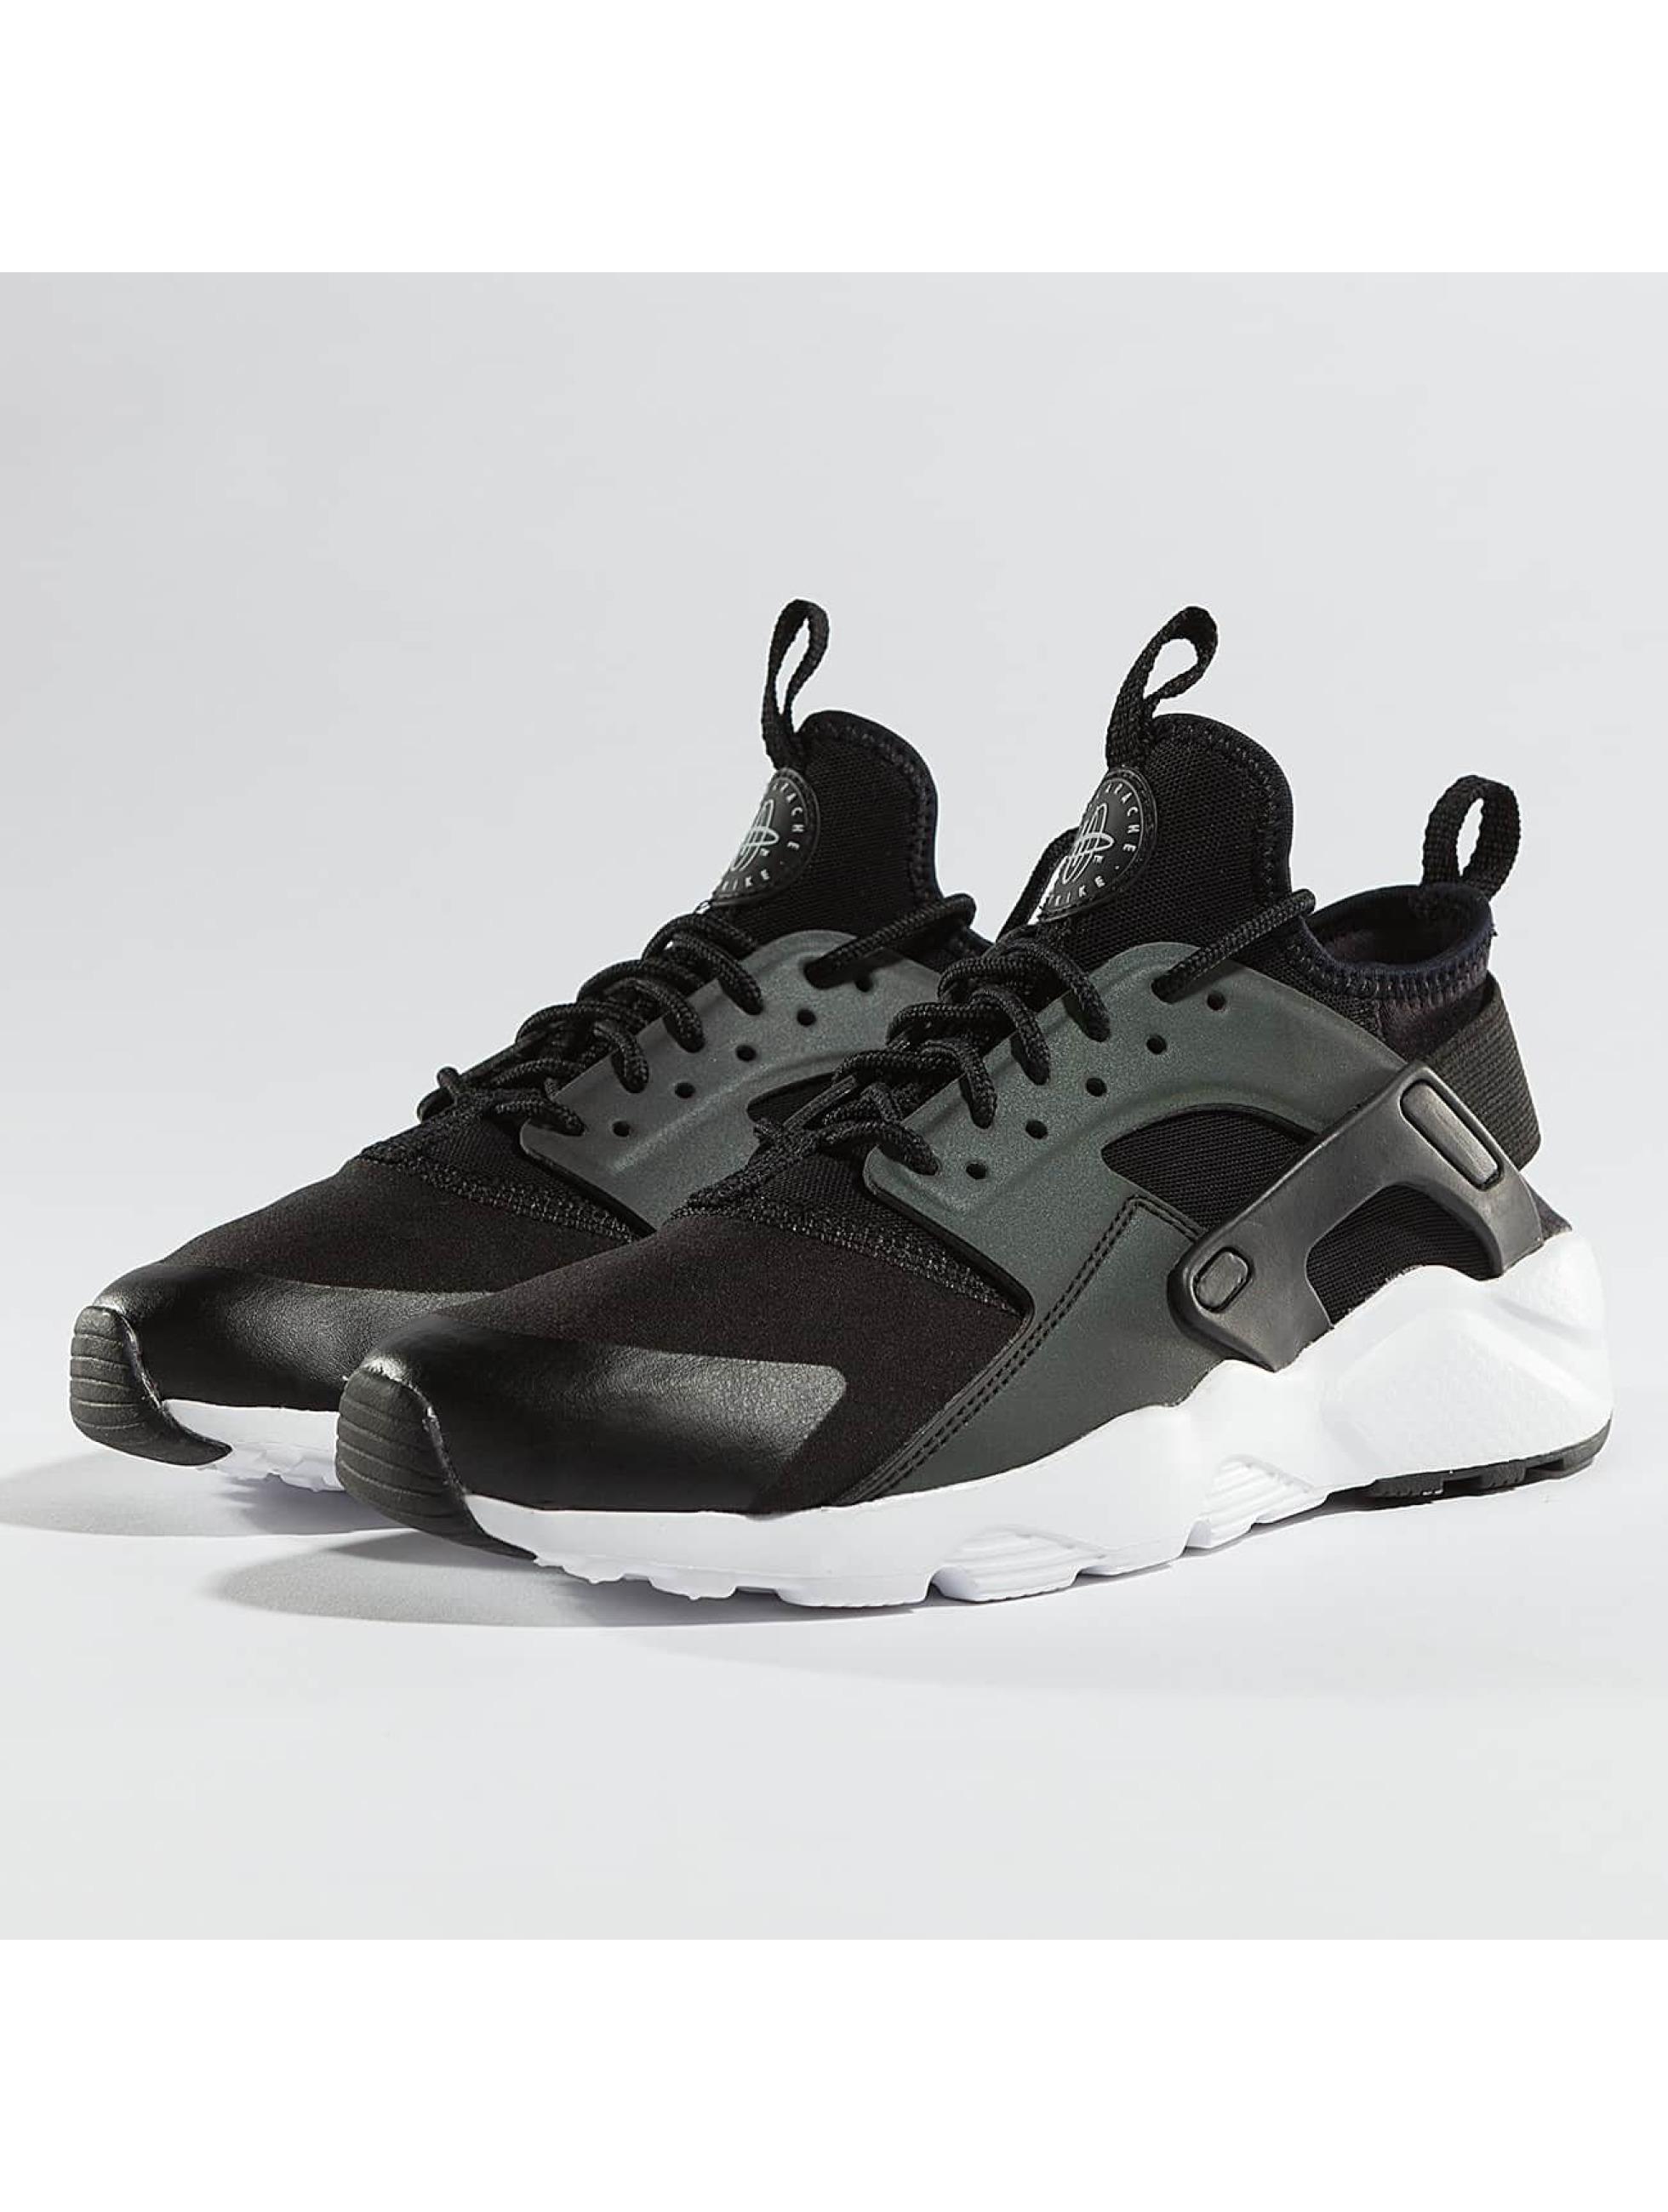 best service 7557b 33946 ... coupon code nike skor sneakers air huarache run ultra se i svart 364880  7d429 b4431